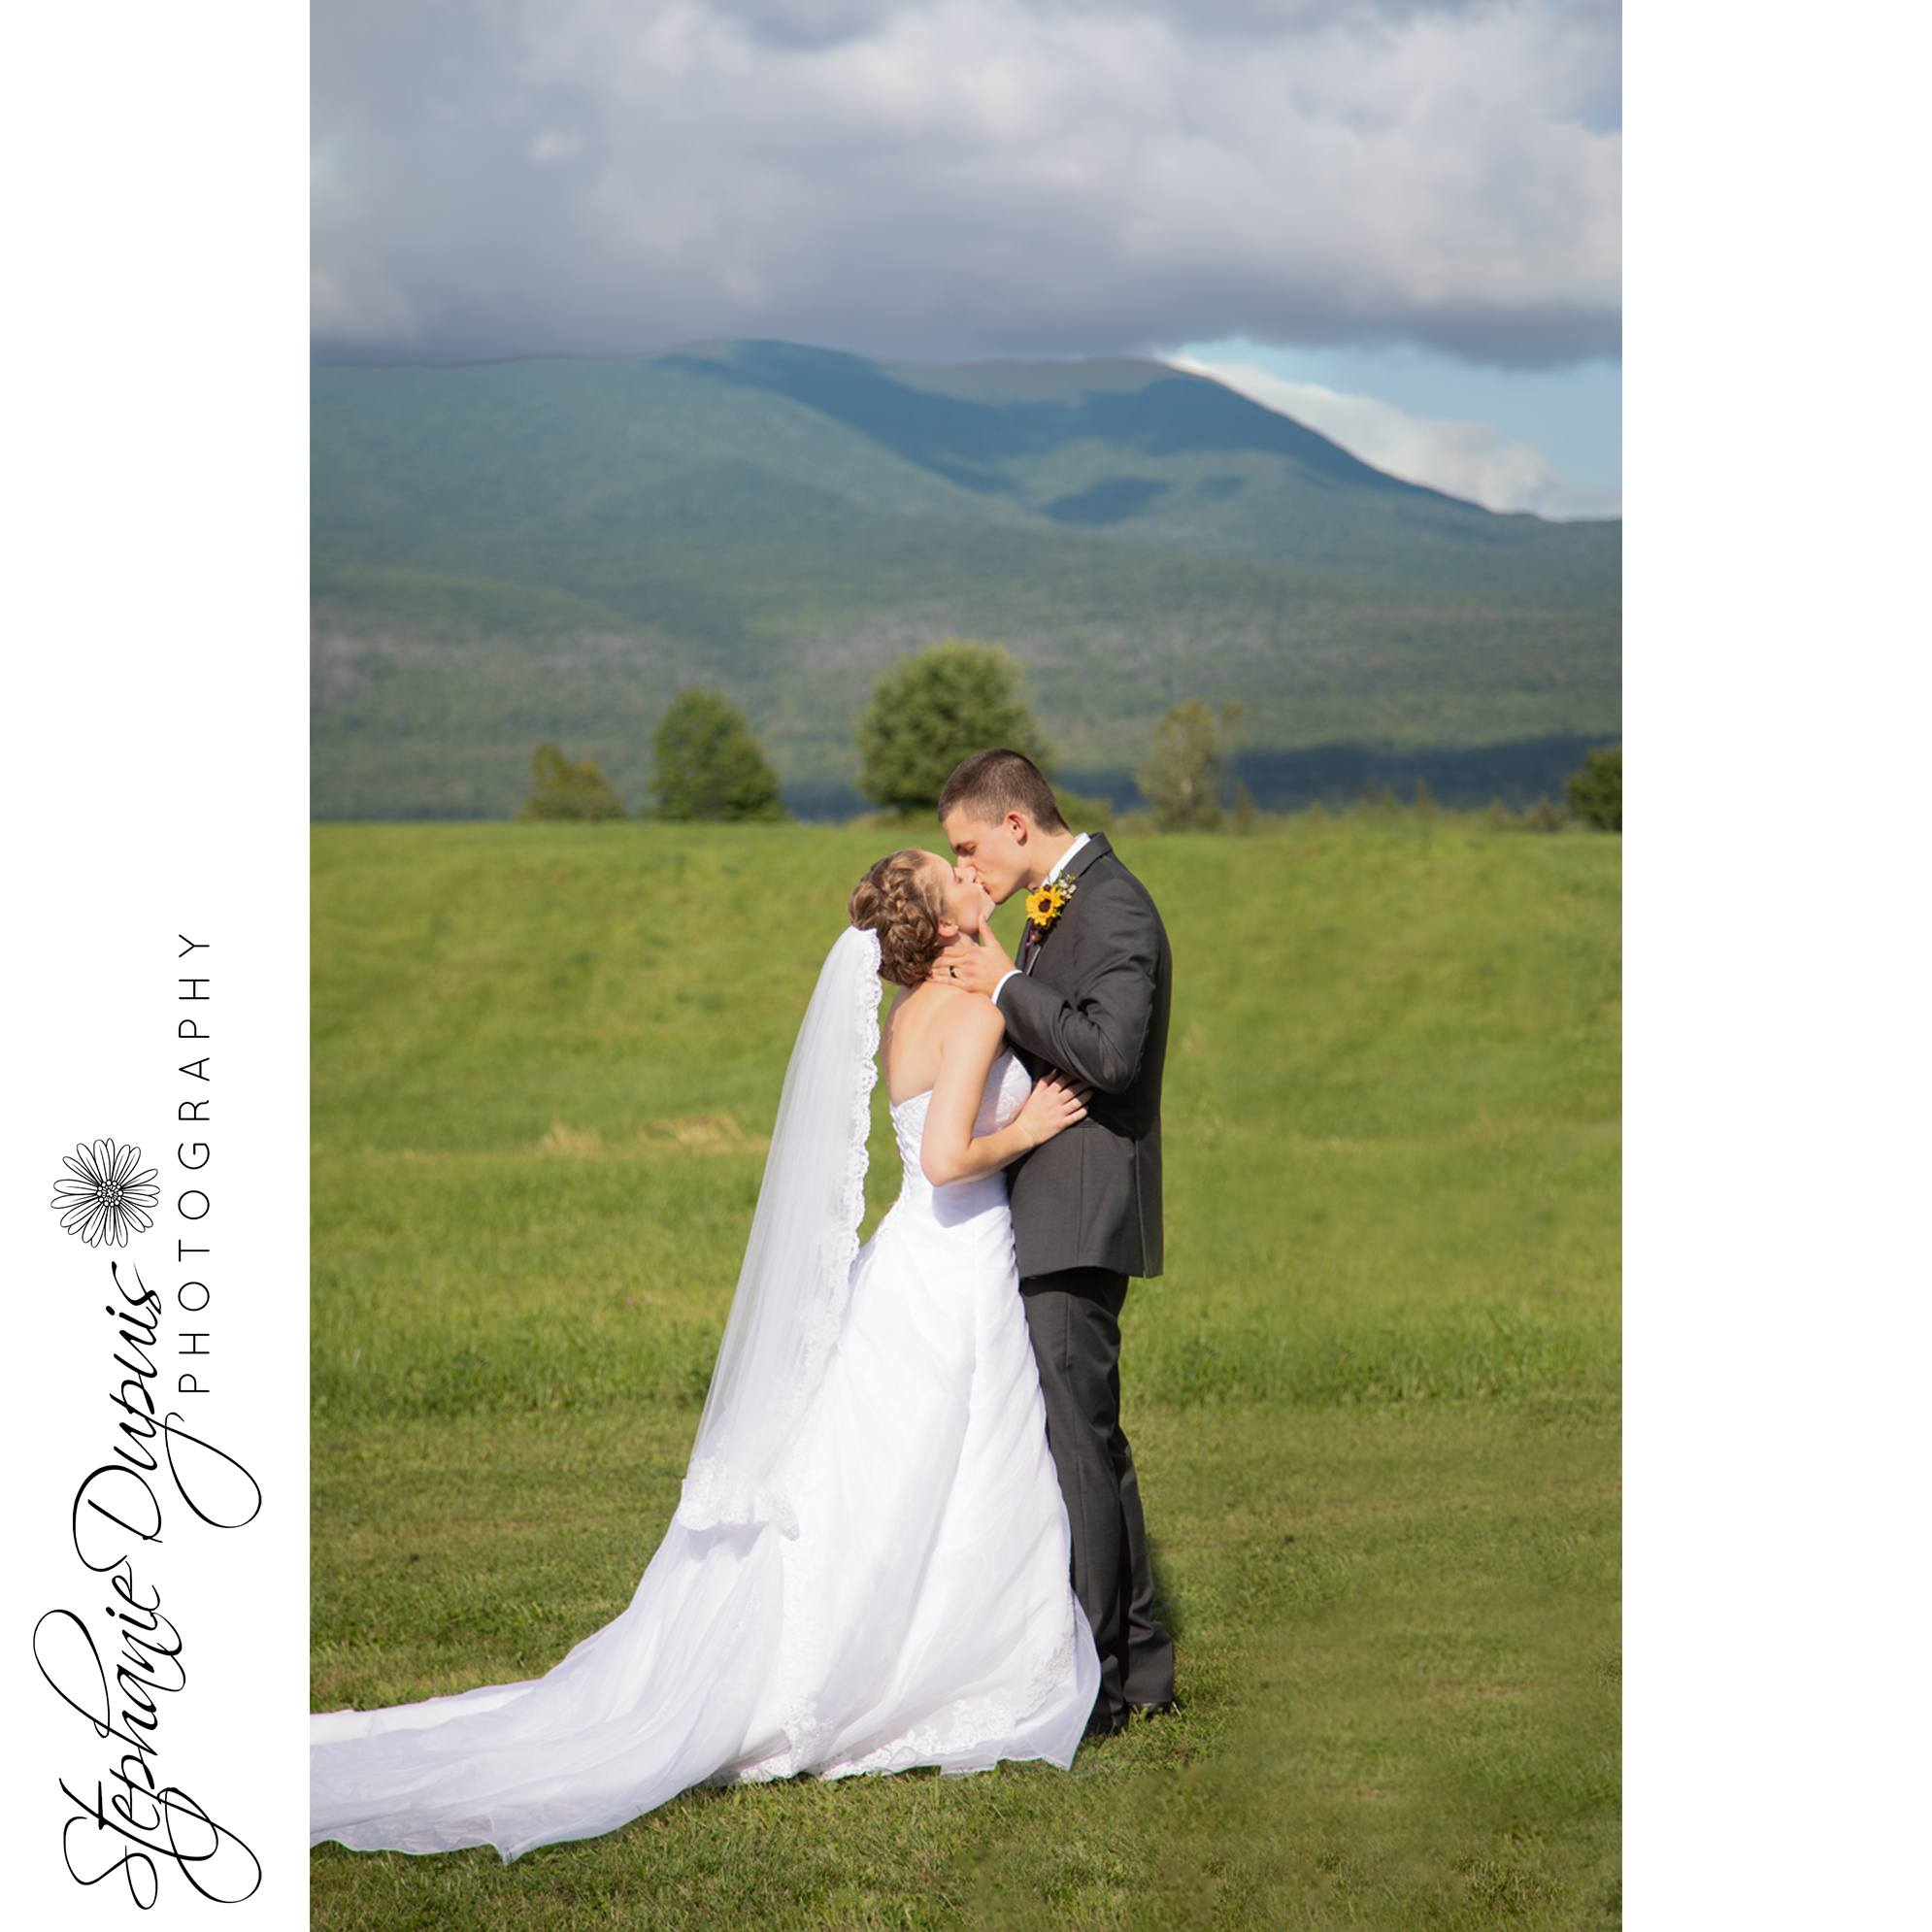 Whitefield Wedding Photographer 01 1 - Portfolio: Ward Wedding